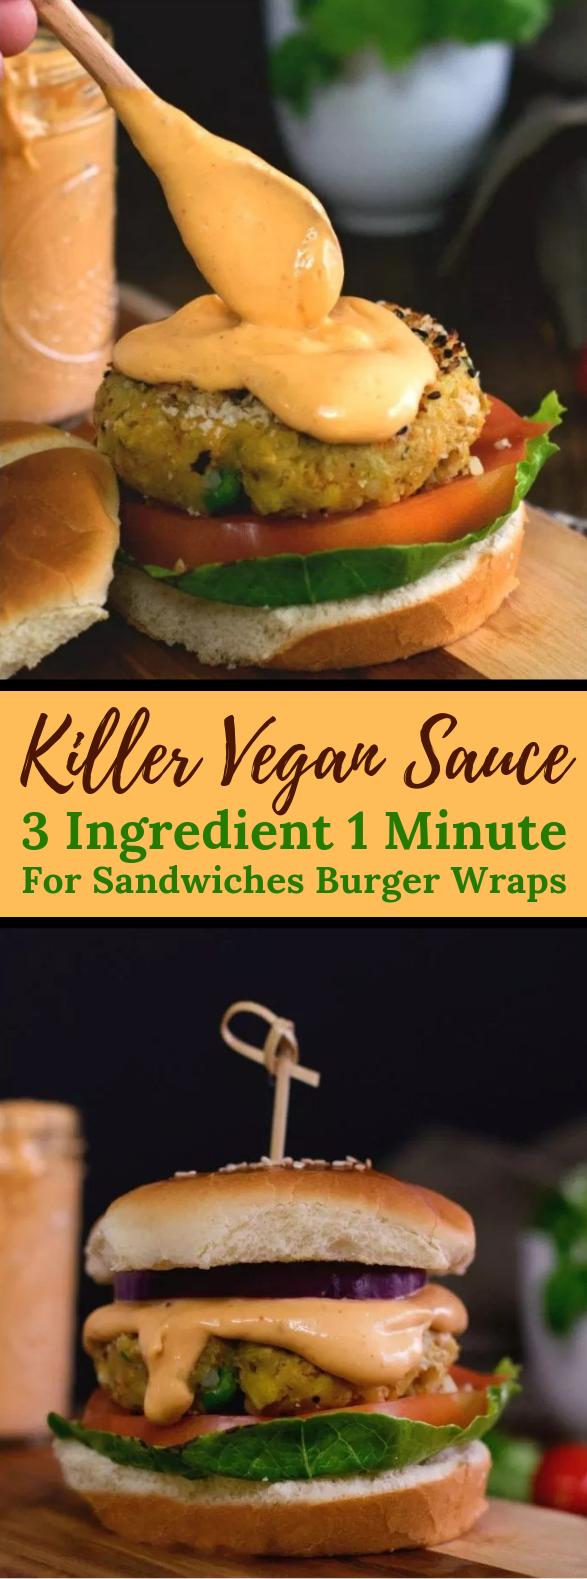 3 INGREDIENT KILLER VEGAN BURGER SAUCE #veganrecipe #glutenfree